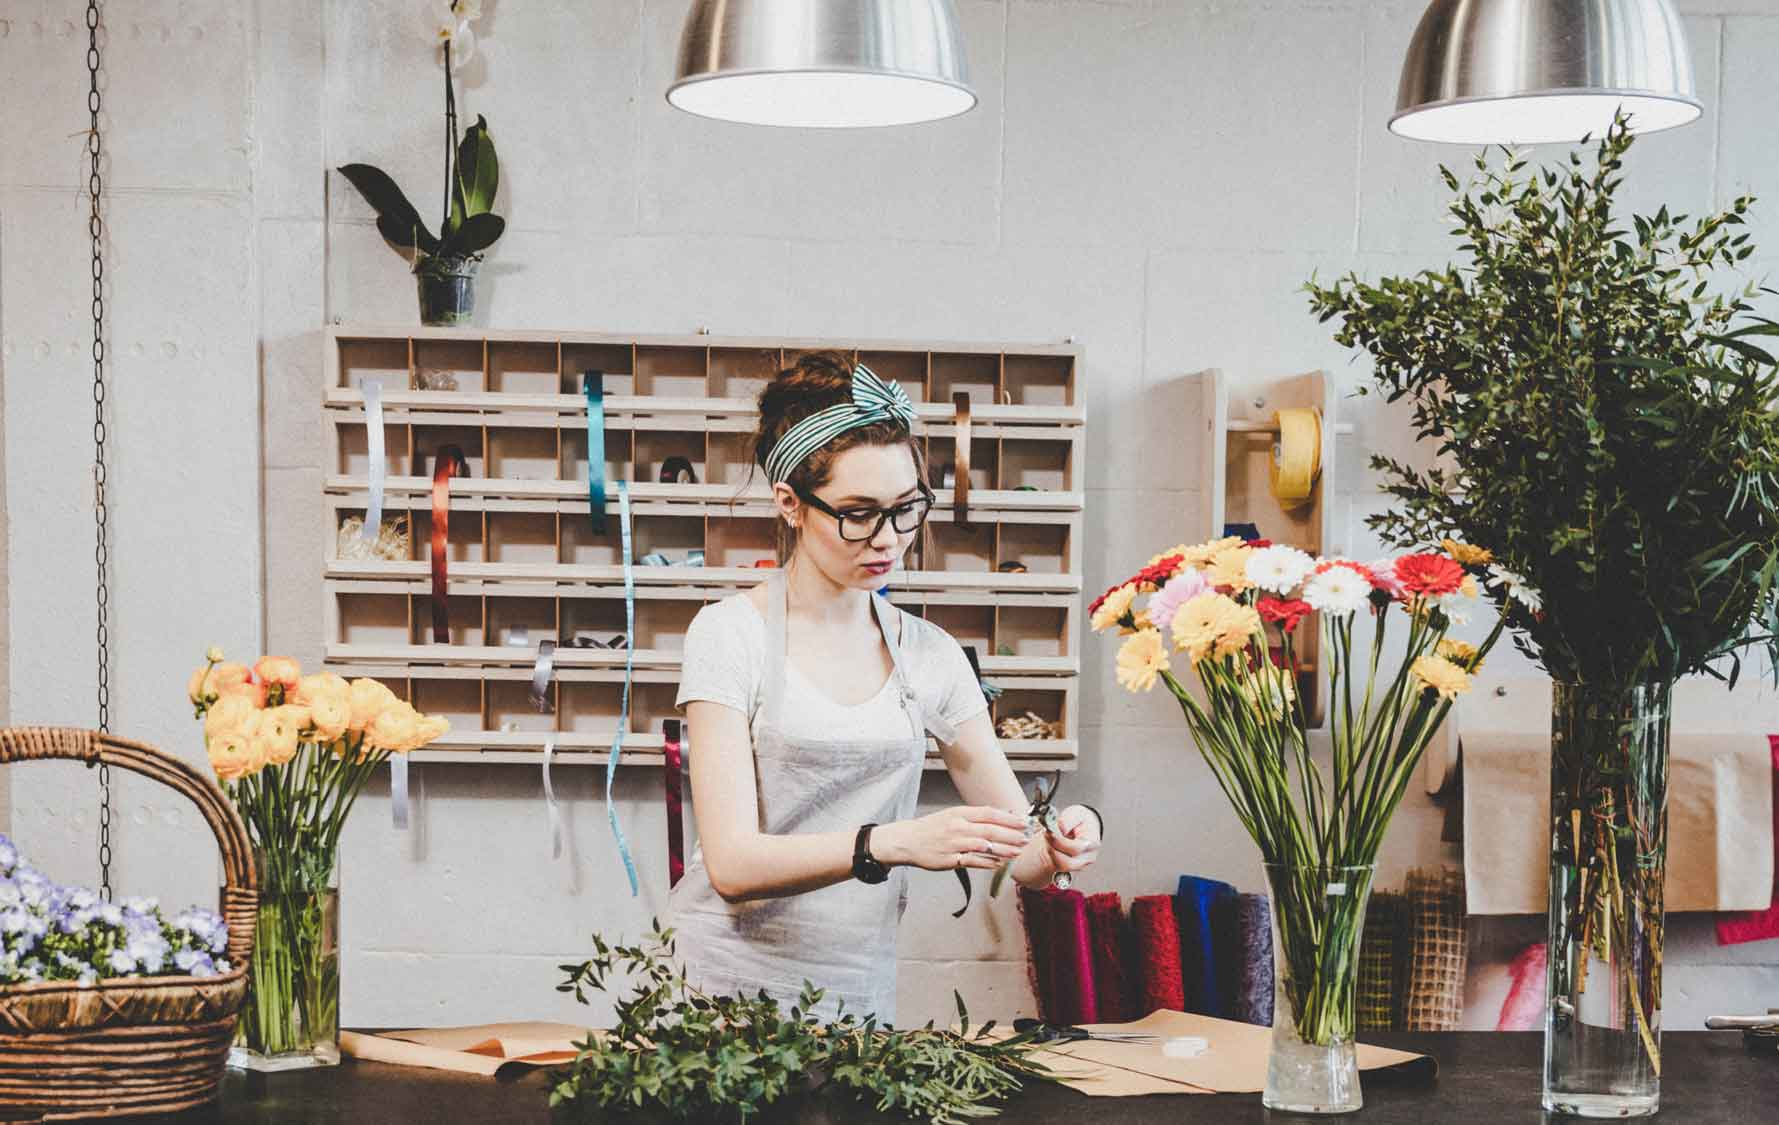 Swiss florist at work